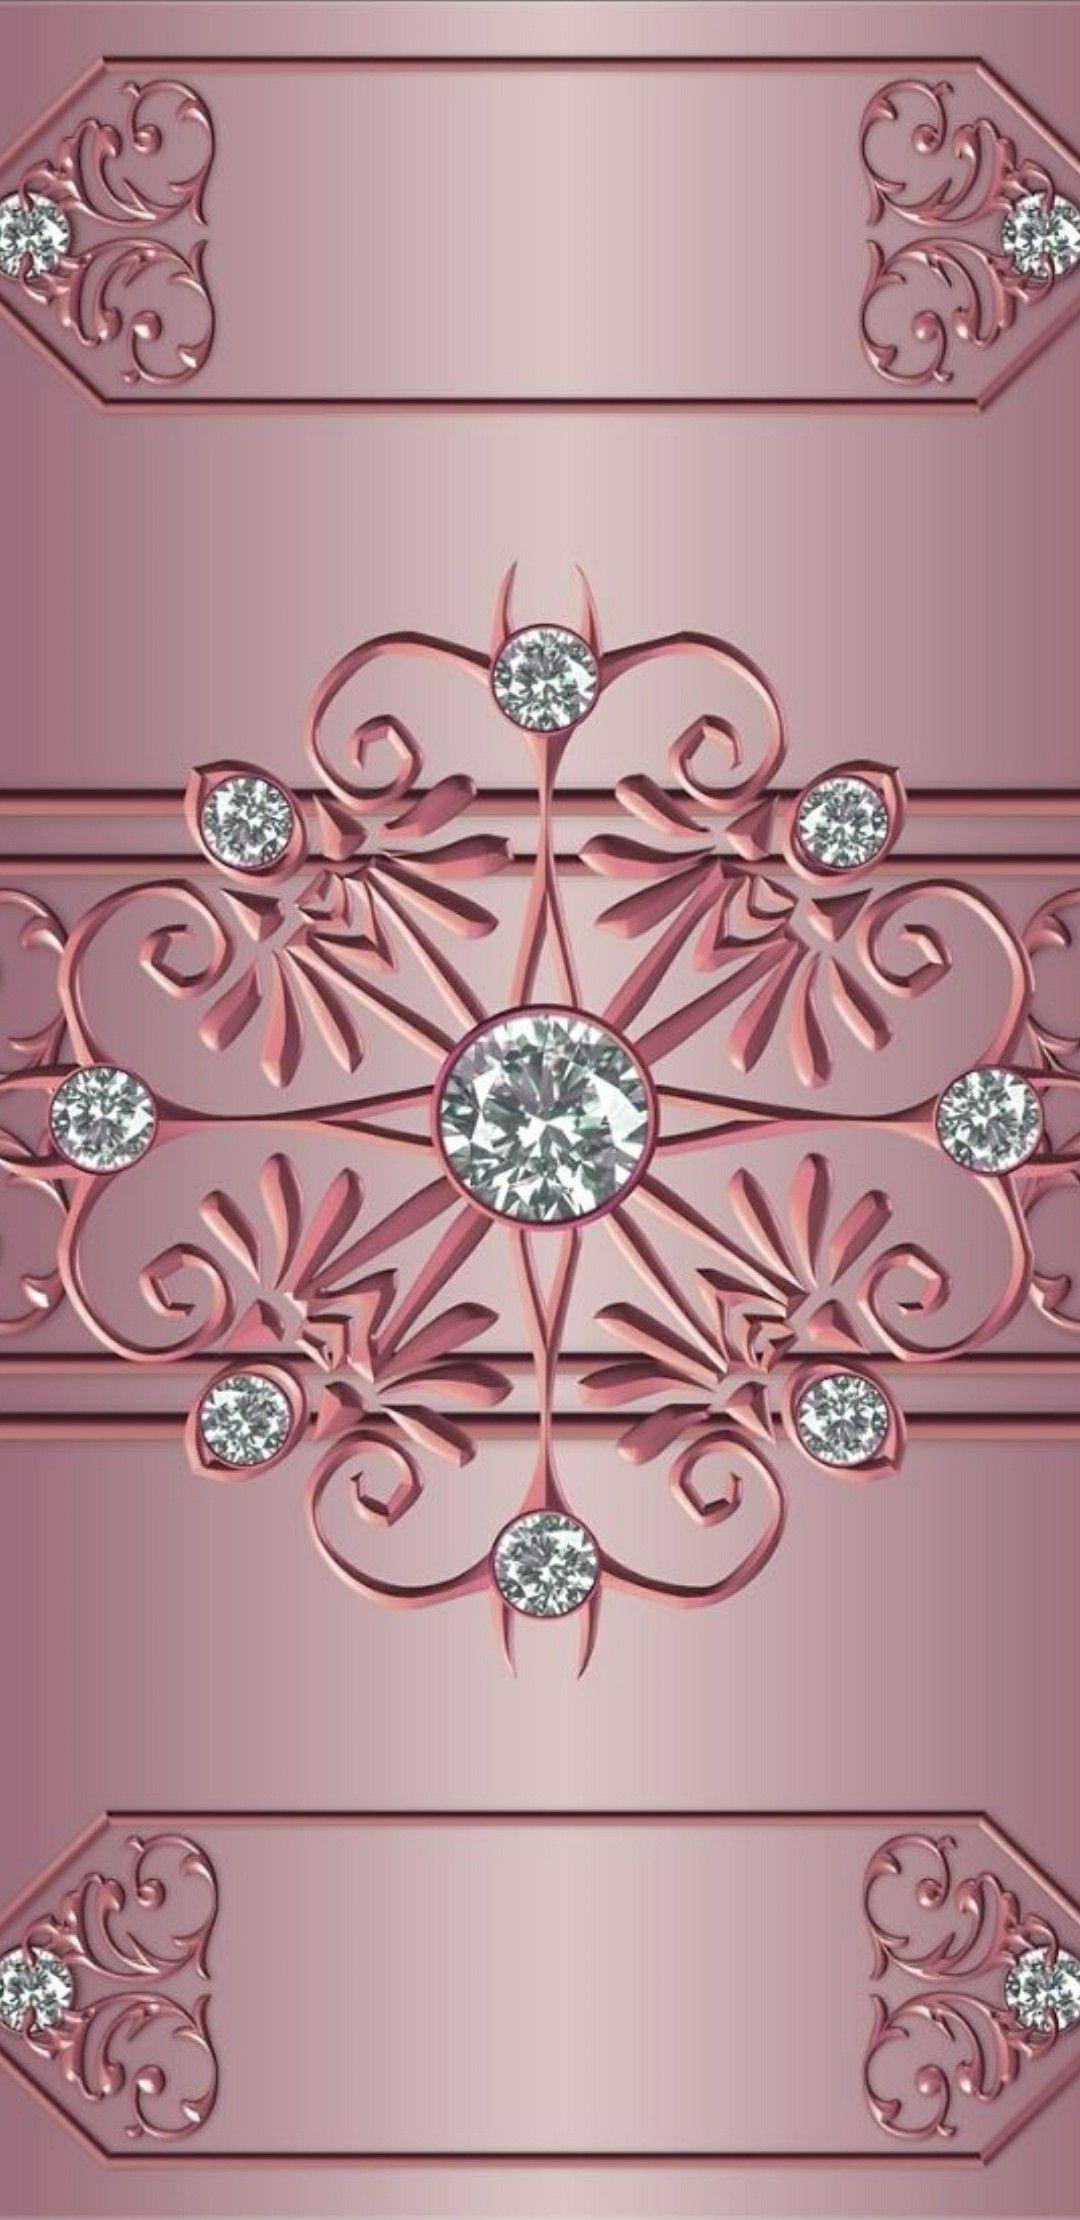 Rose Gold Diamond Phone Wallpaper Rose Gold Wallpaper Gold Wallpaper Iphone Rose Gold Backgrounds